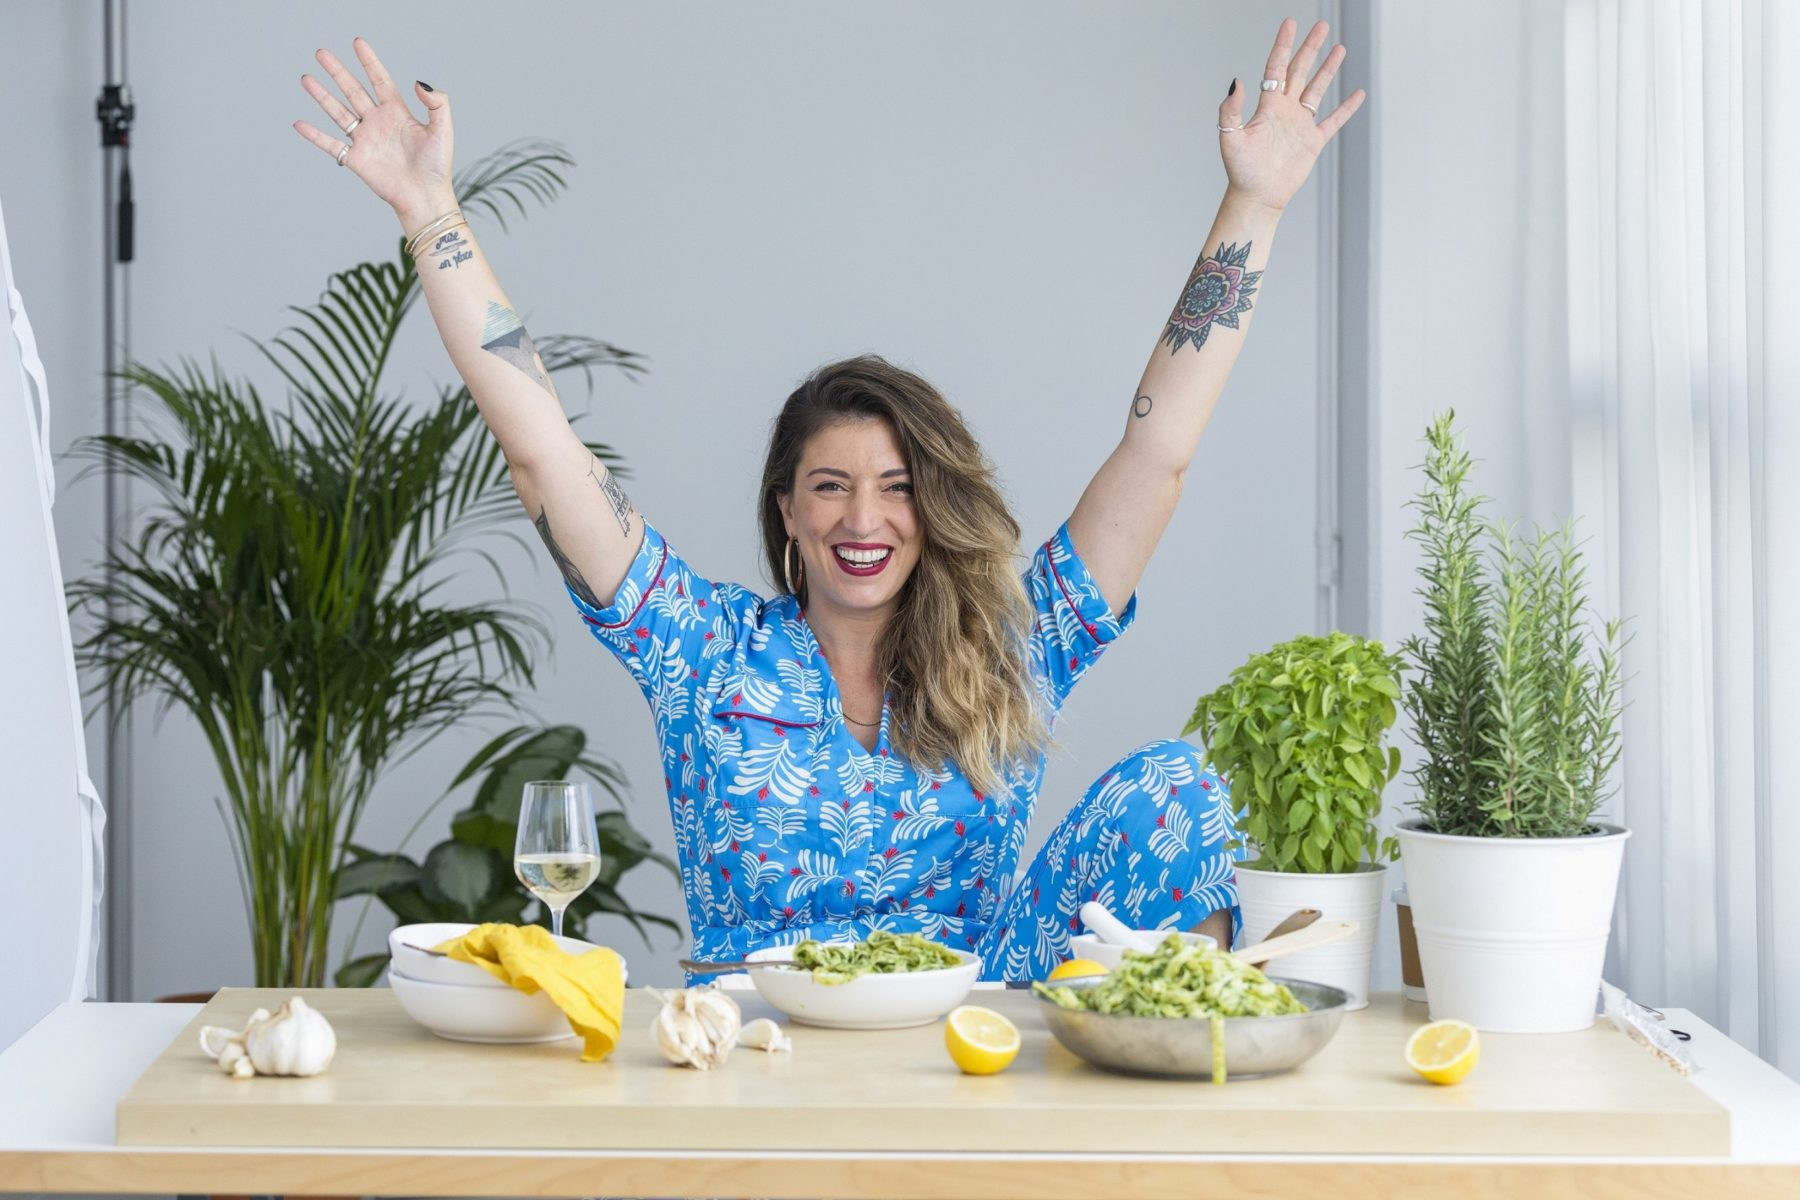 H «Madame Ginger» έρχεται στο OPEN με την πρώτη green μαγειρική εκπομπή της  ελληνικής τηλεόρασης